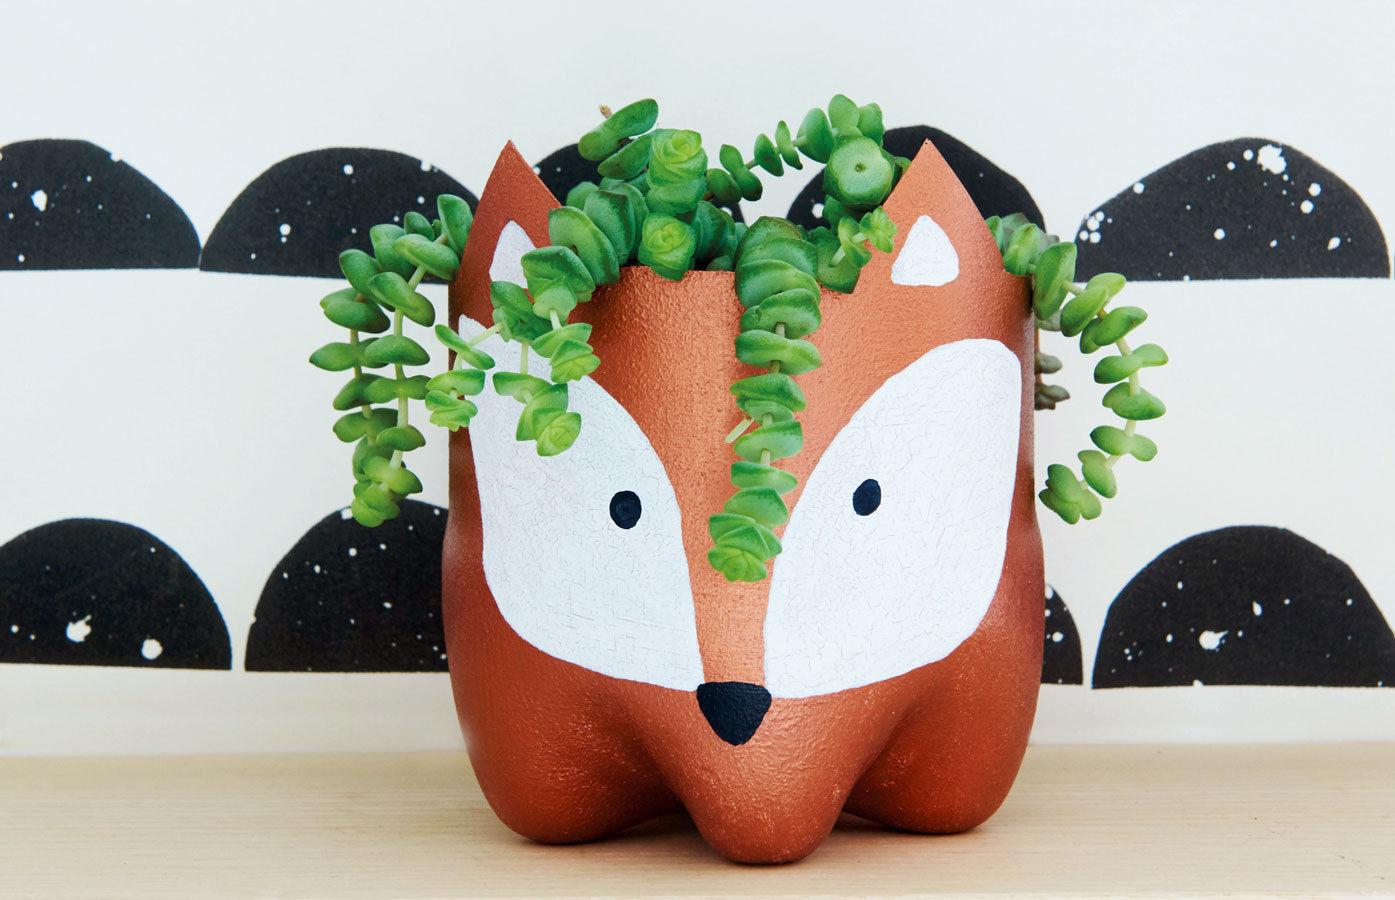 Makerist-Basteln-mit-Kindern-50-DIY-Projekte-Fuchs-Blumentopf